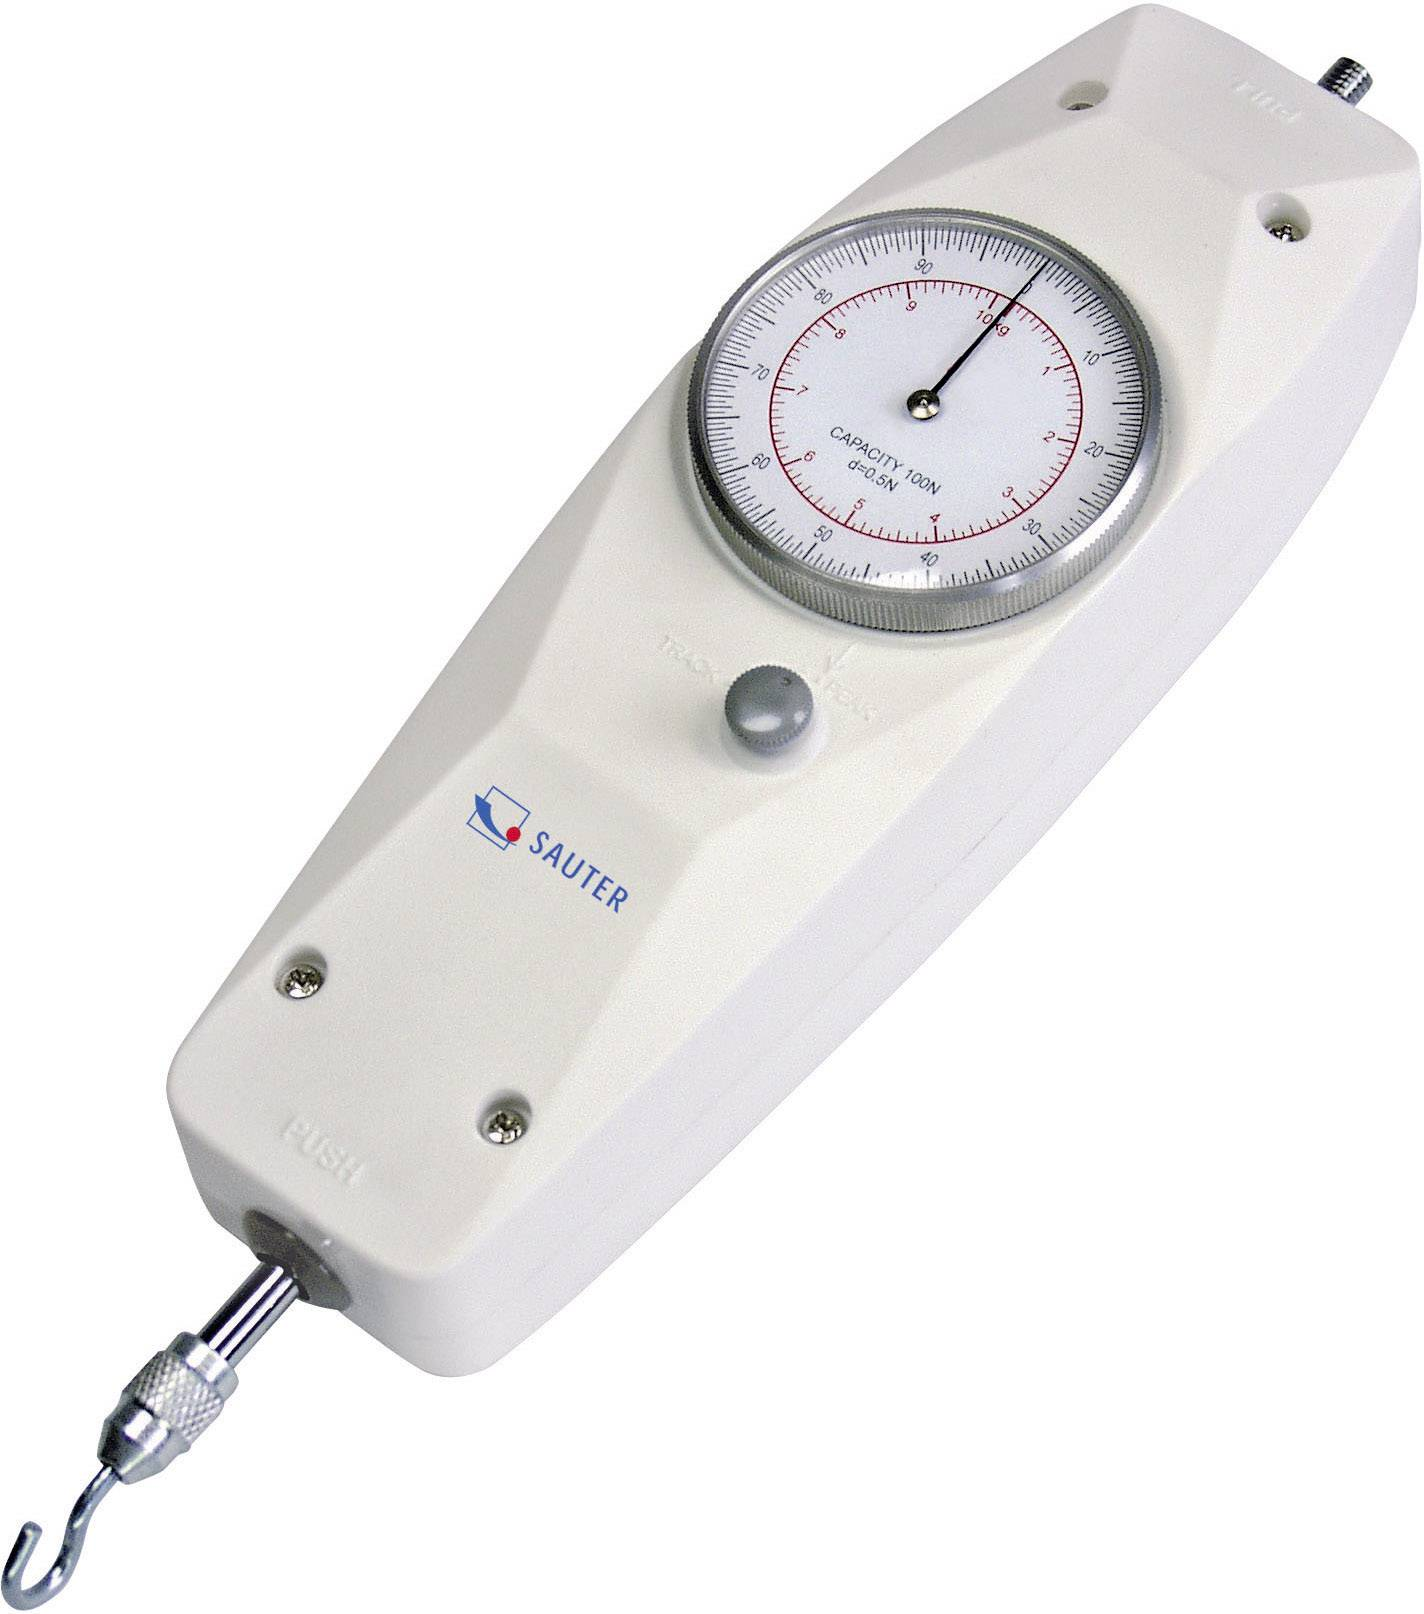 Sauter FA 100. Kraftmessgerät, Newton-Meter 100 N Kalibrováno dle ISO